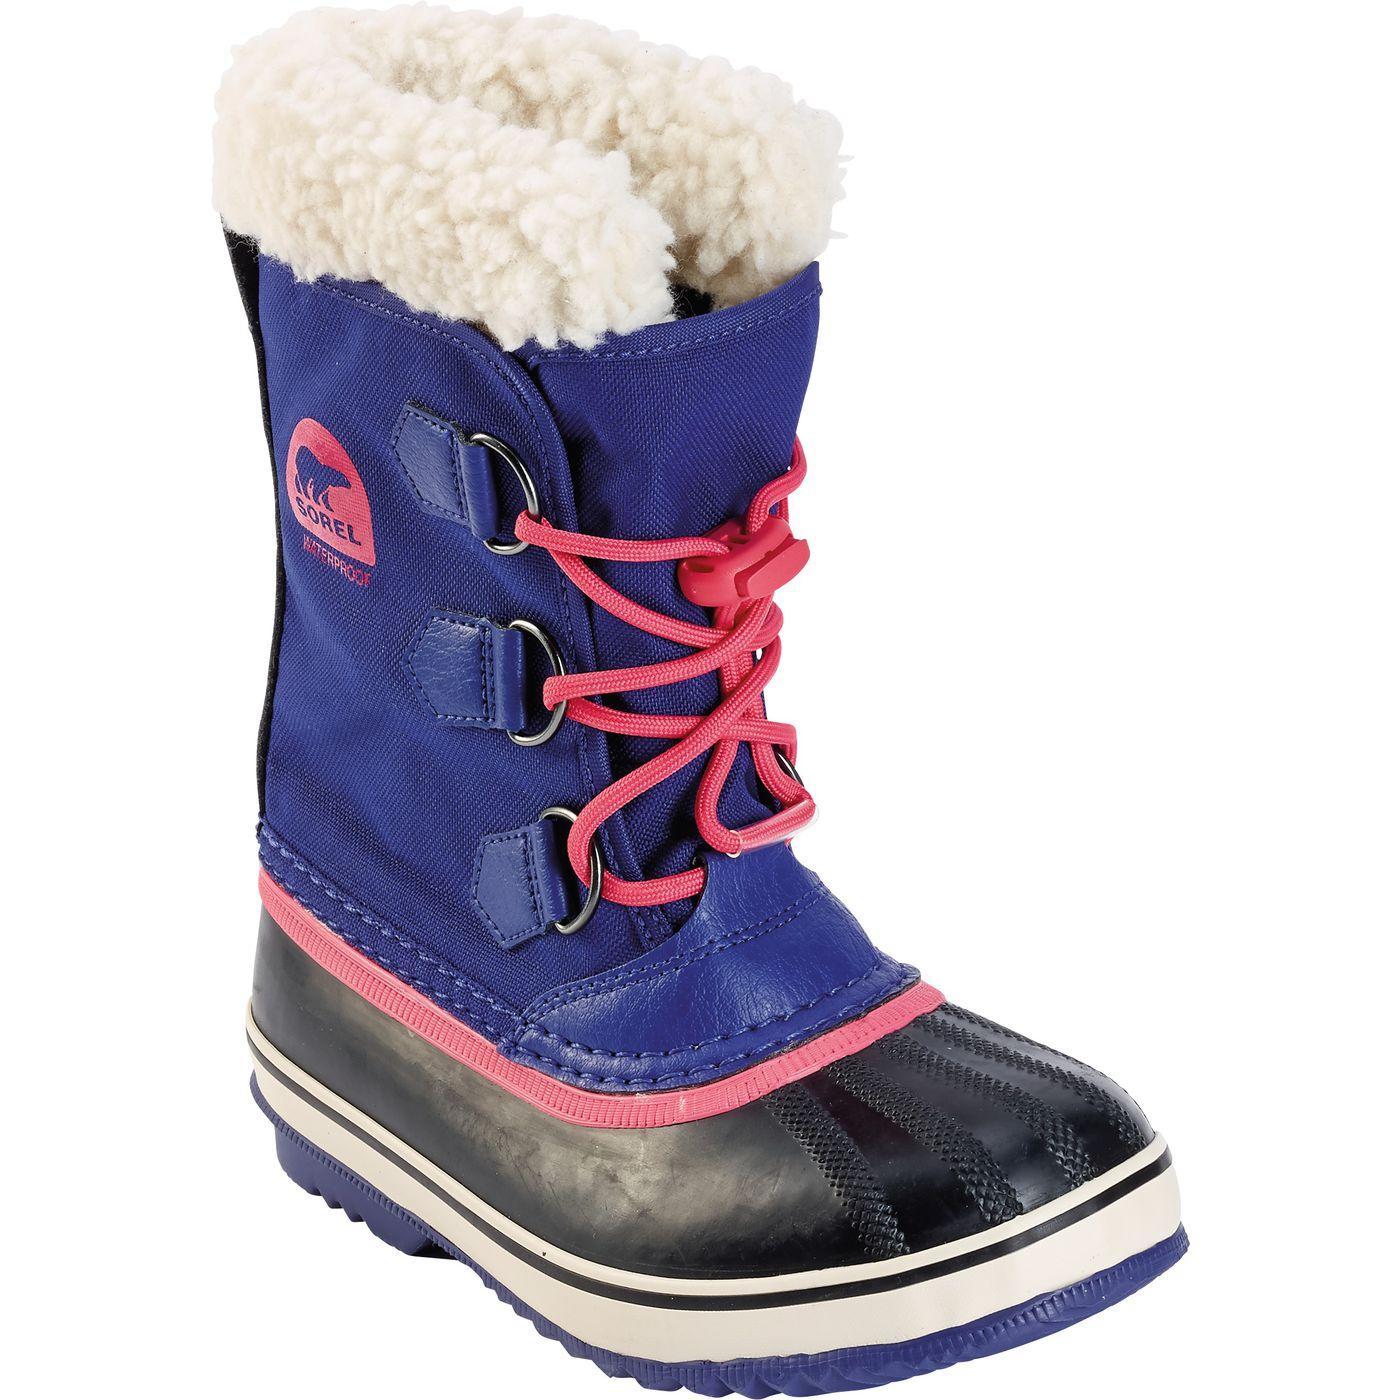 Детские зимние ботинки Sorel Yoot pac Nylon